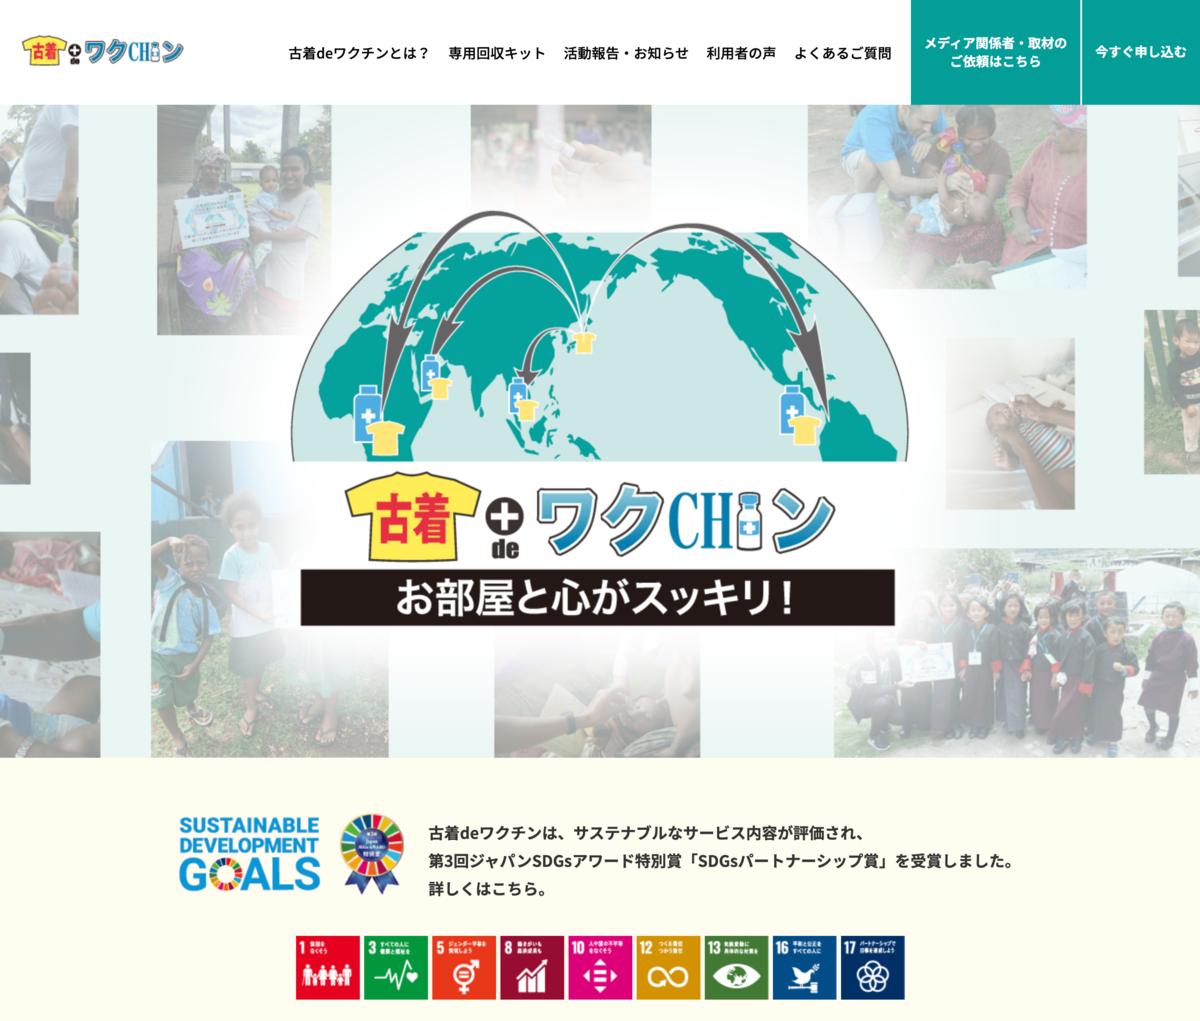 f:id:naoko-moriyama:20200815202316p:plain